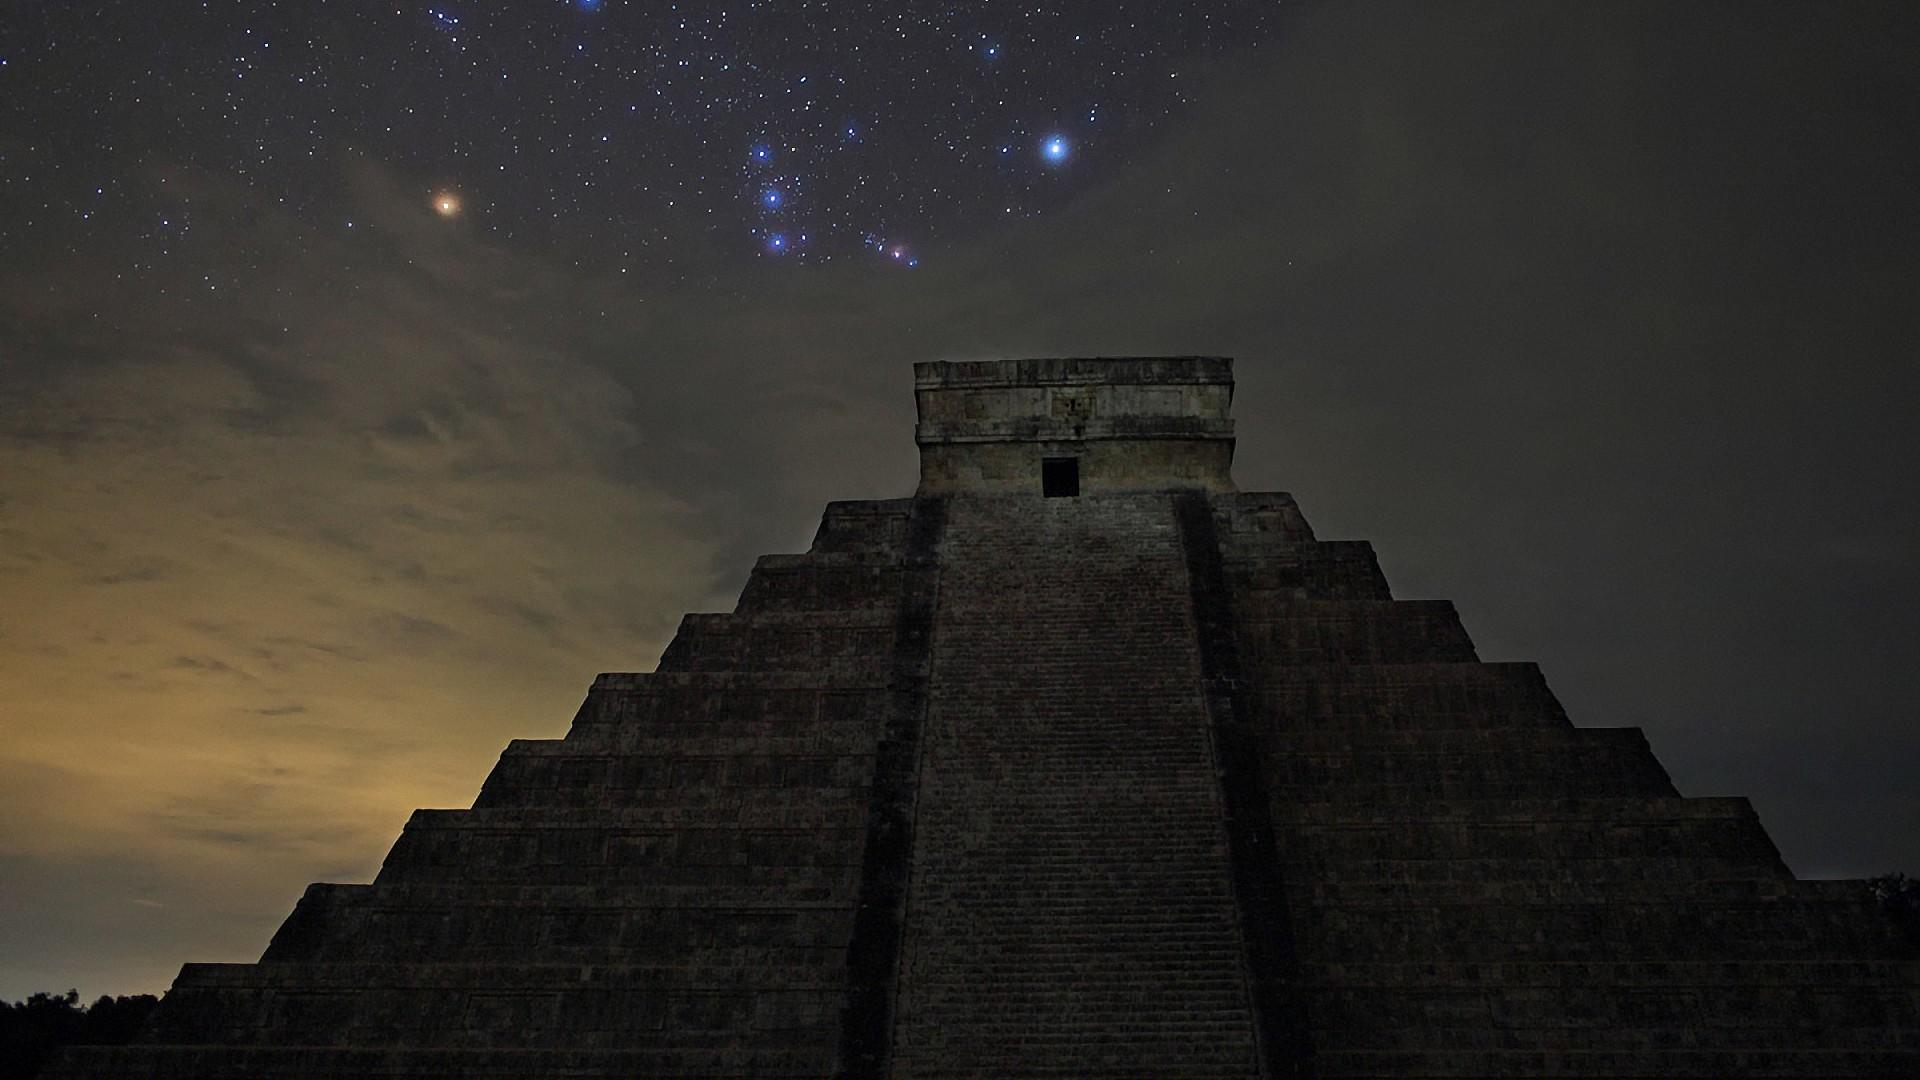 HD Constellation k Photo 1920×1080